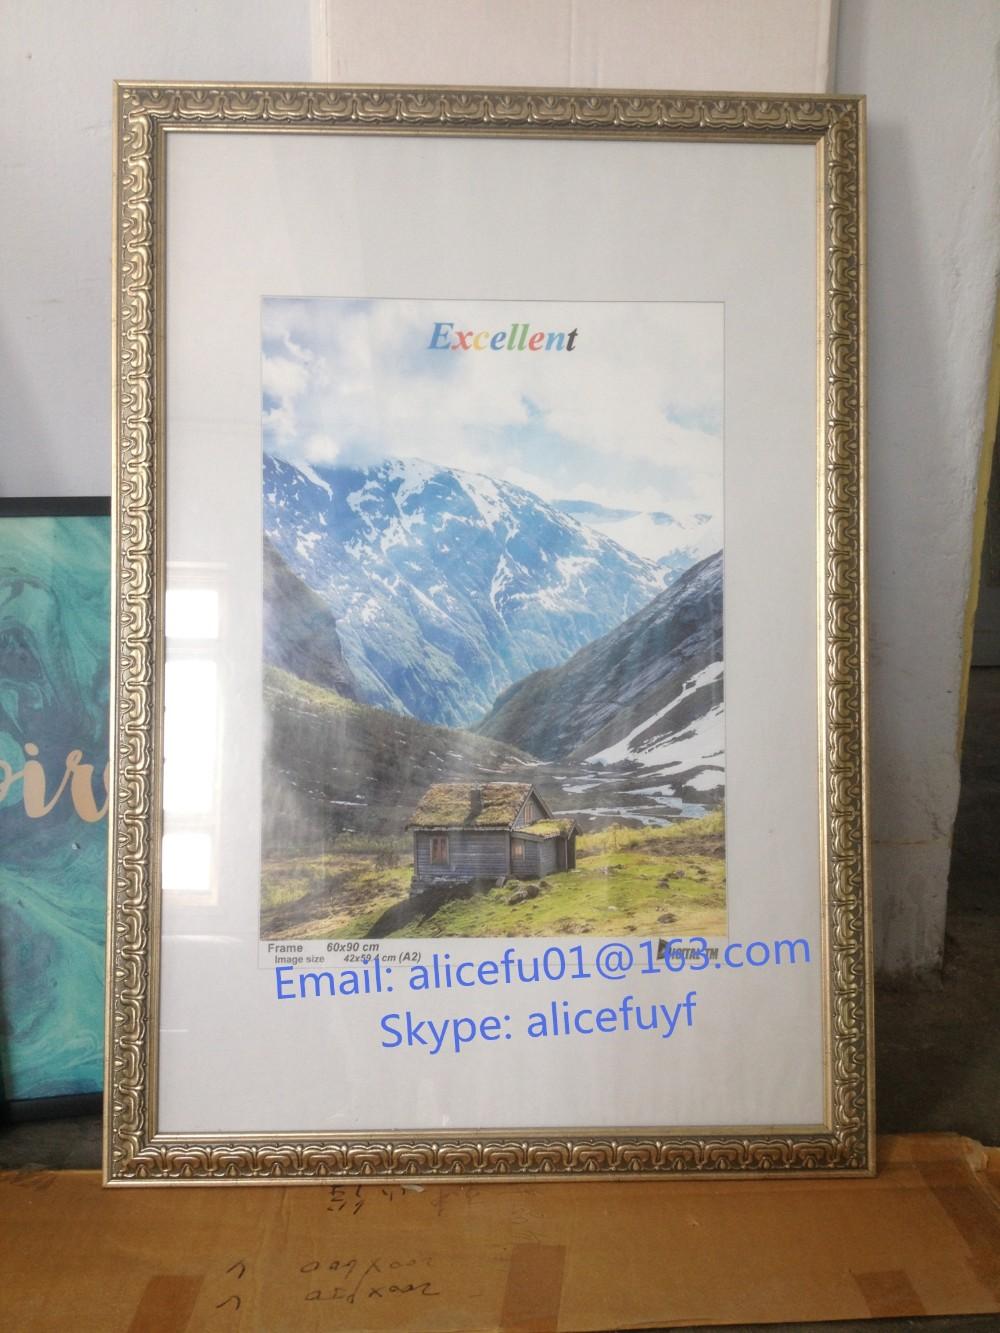 Bulk Wholesale Large Size Plastic Poster Frame A1 A2 A3 A4 - Buy Photo ...